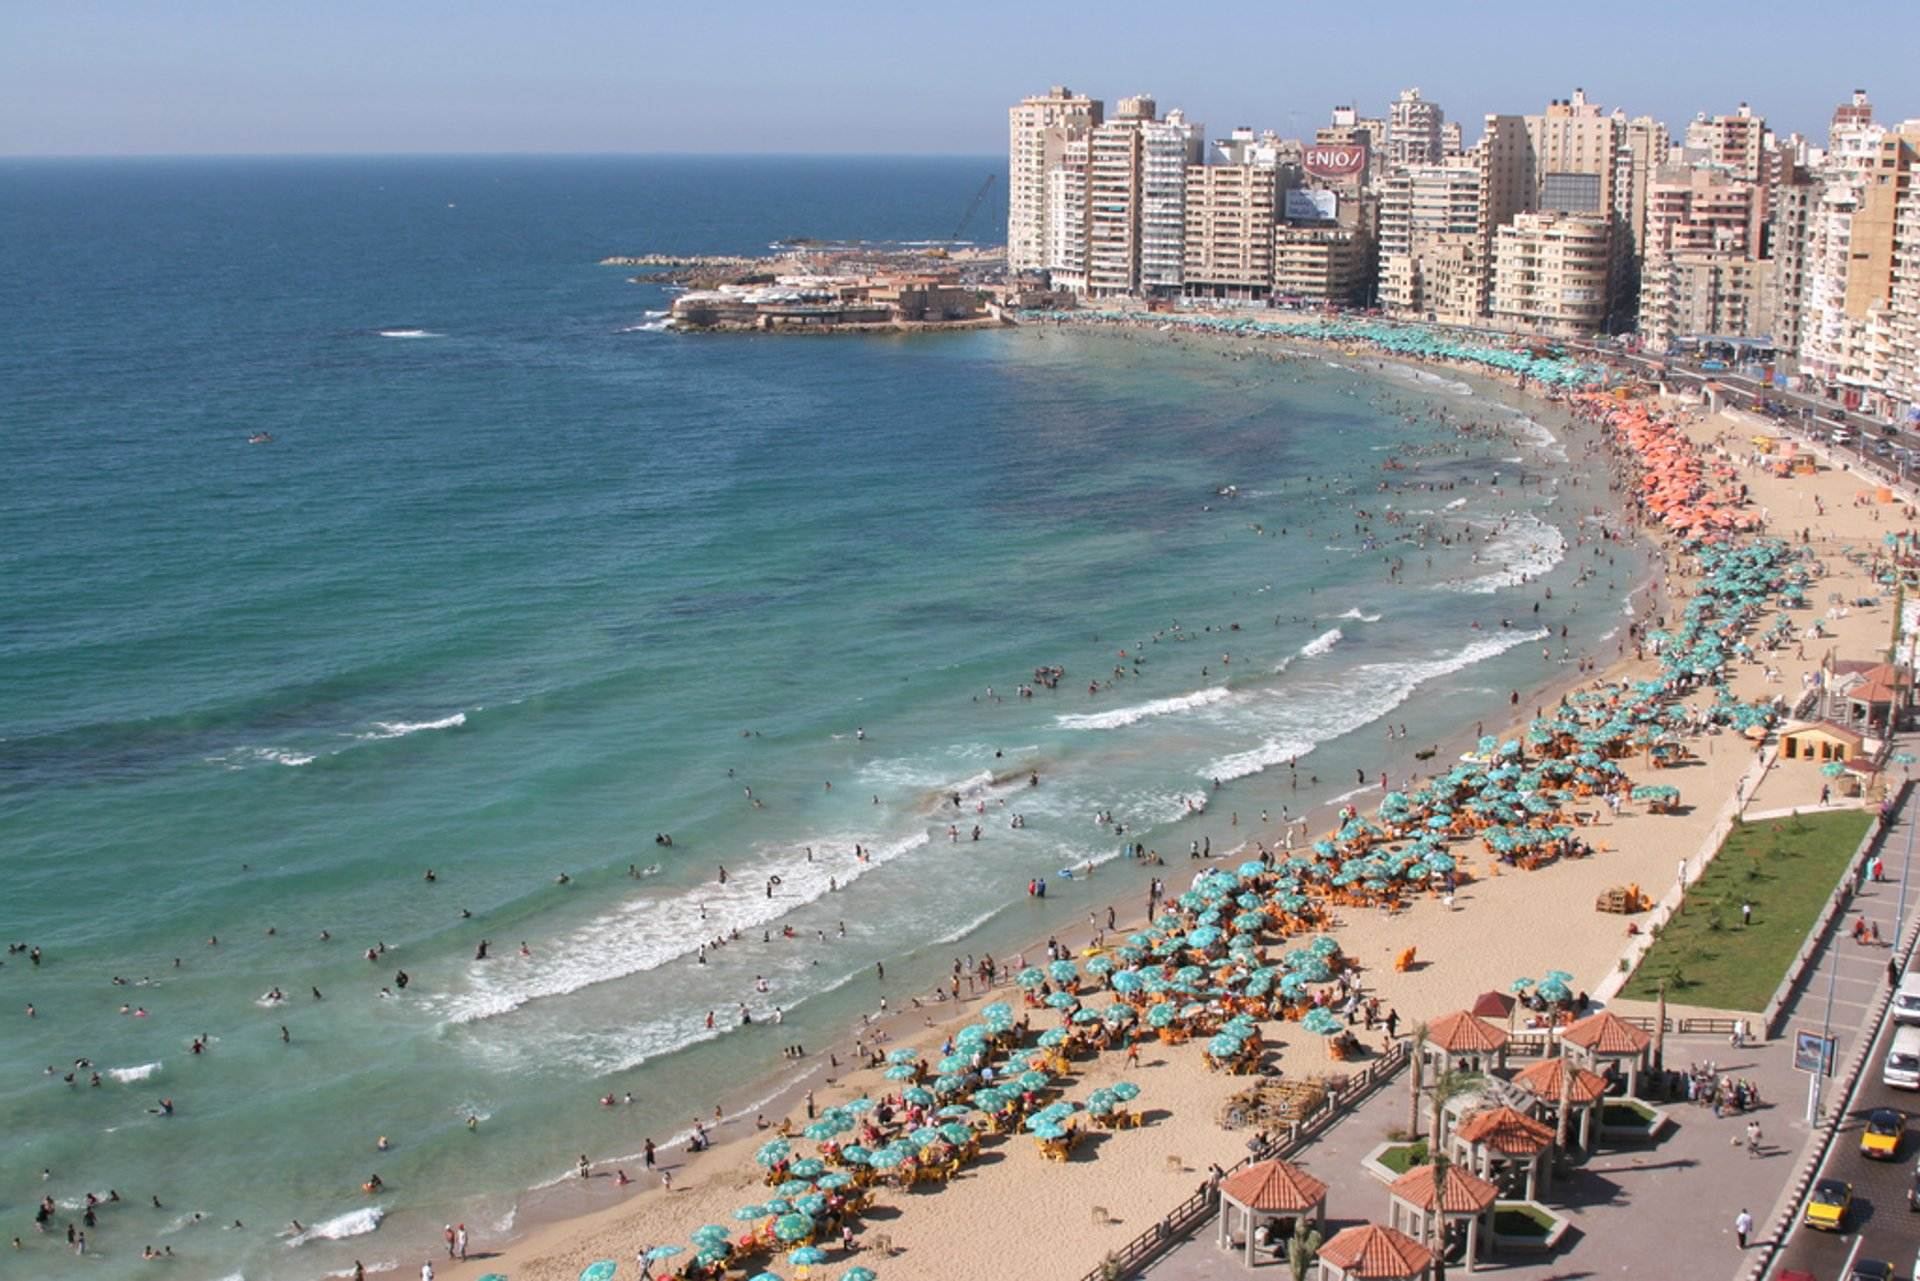 Sidi Beshr Bahri, Alexandria, Egypt 2020